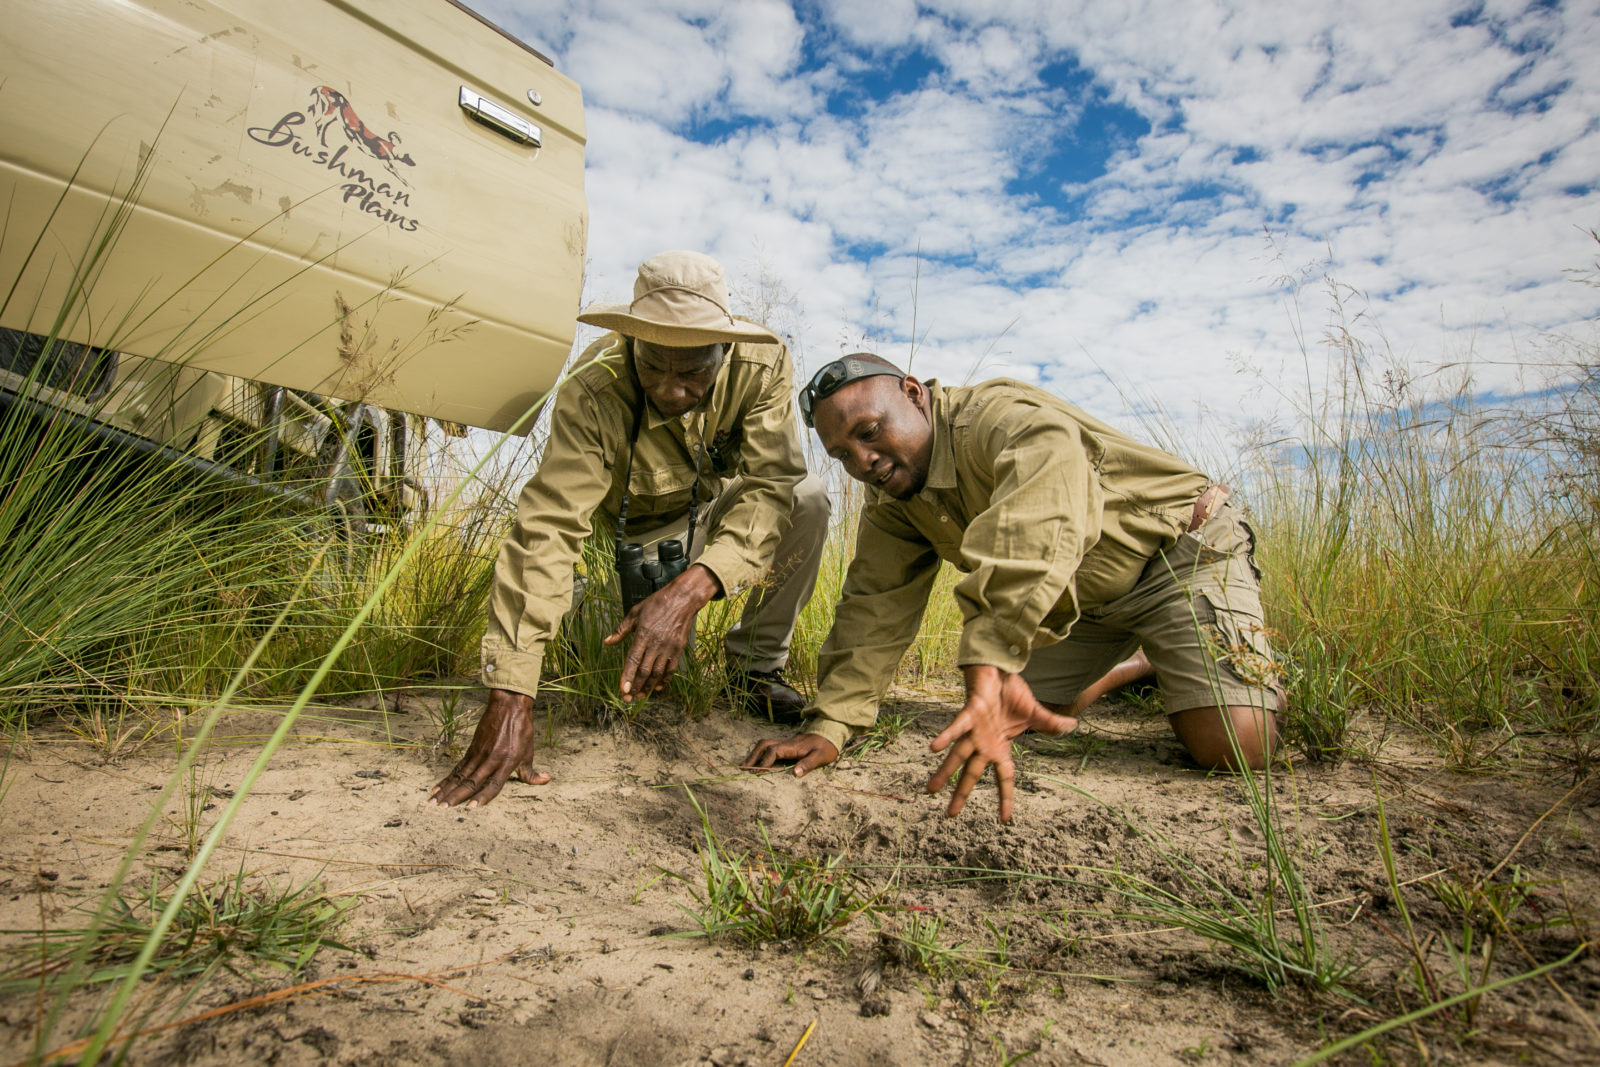 Tracking spoor at Bushman Plains Camp